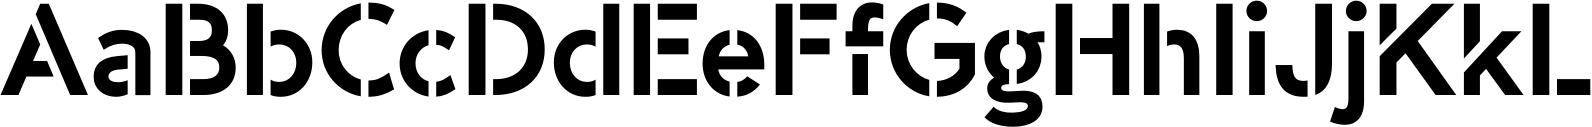 -OC Format Stencil